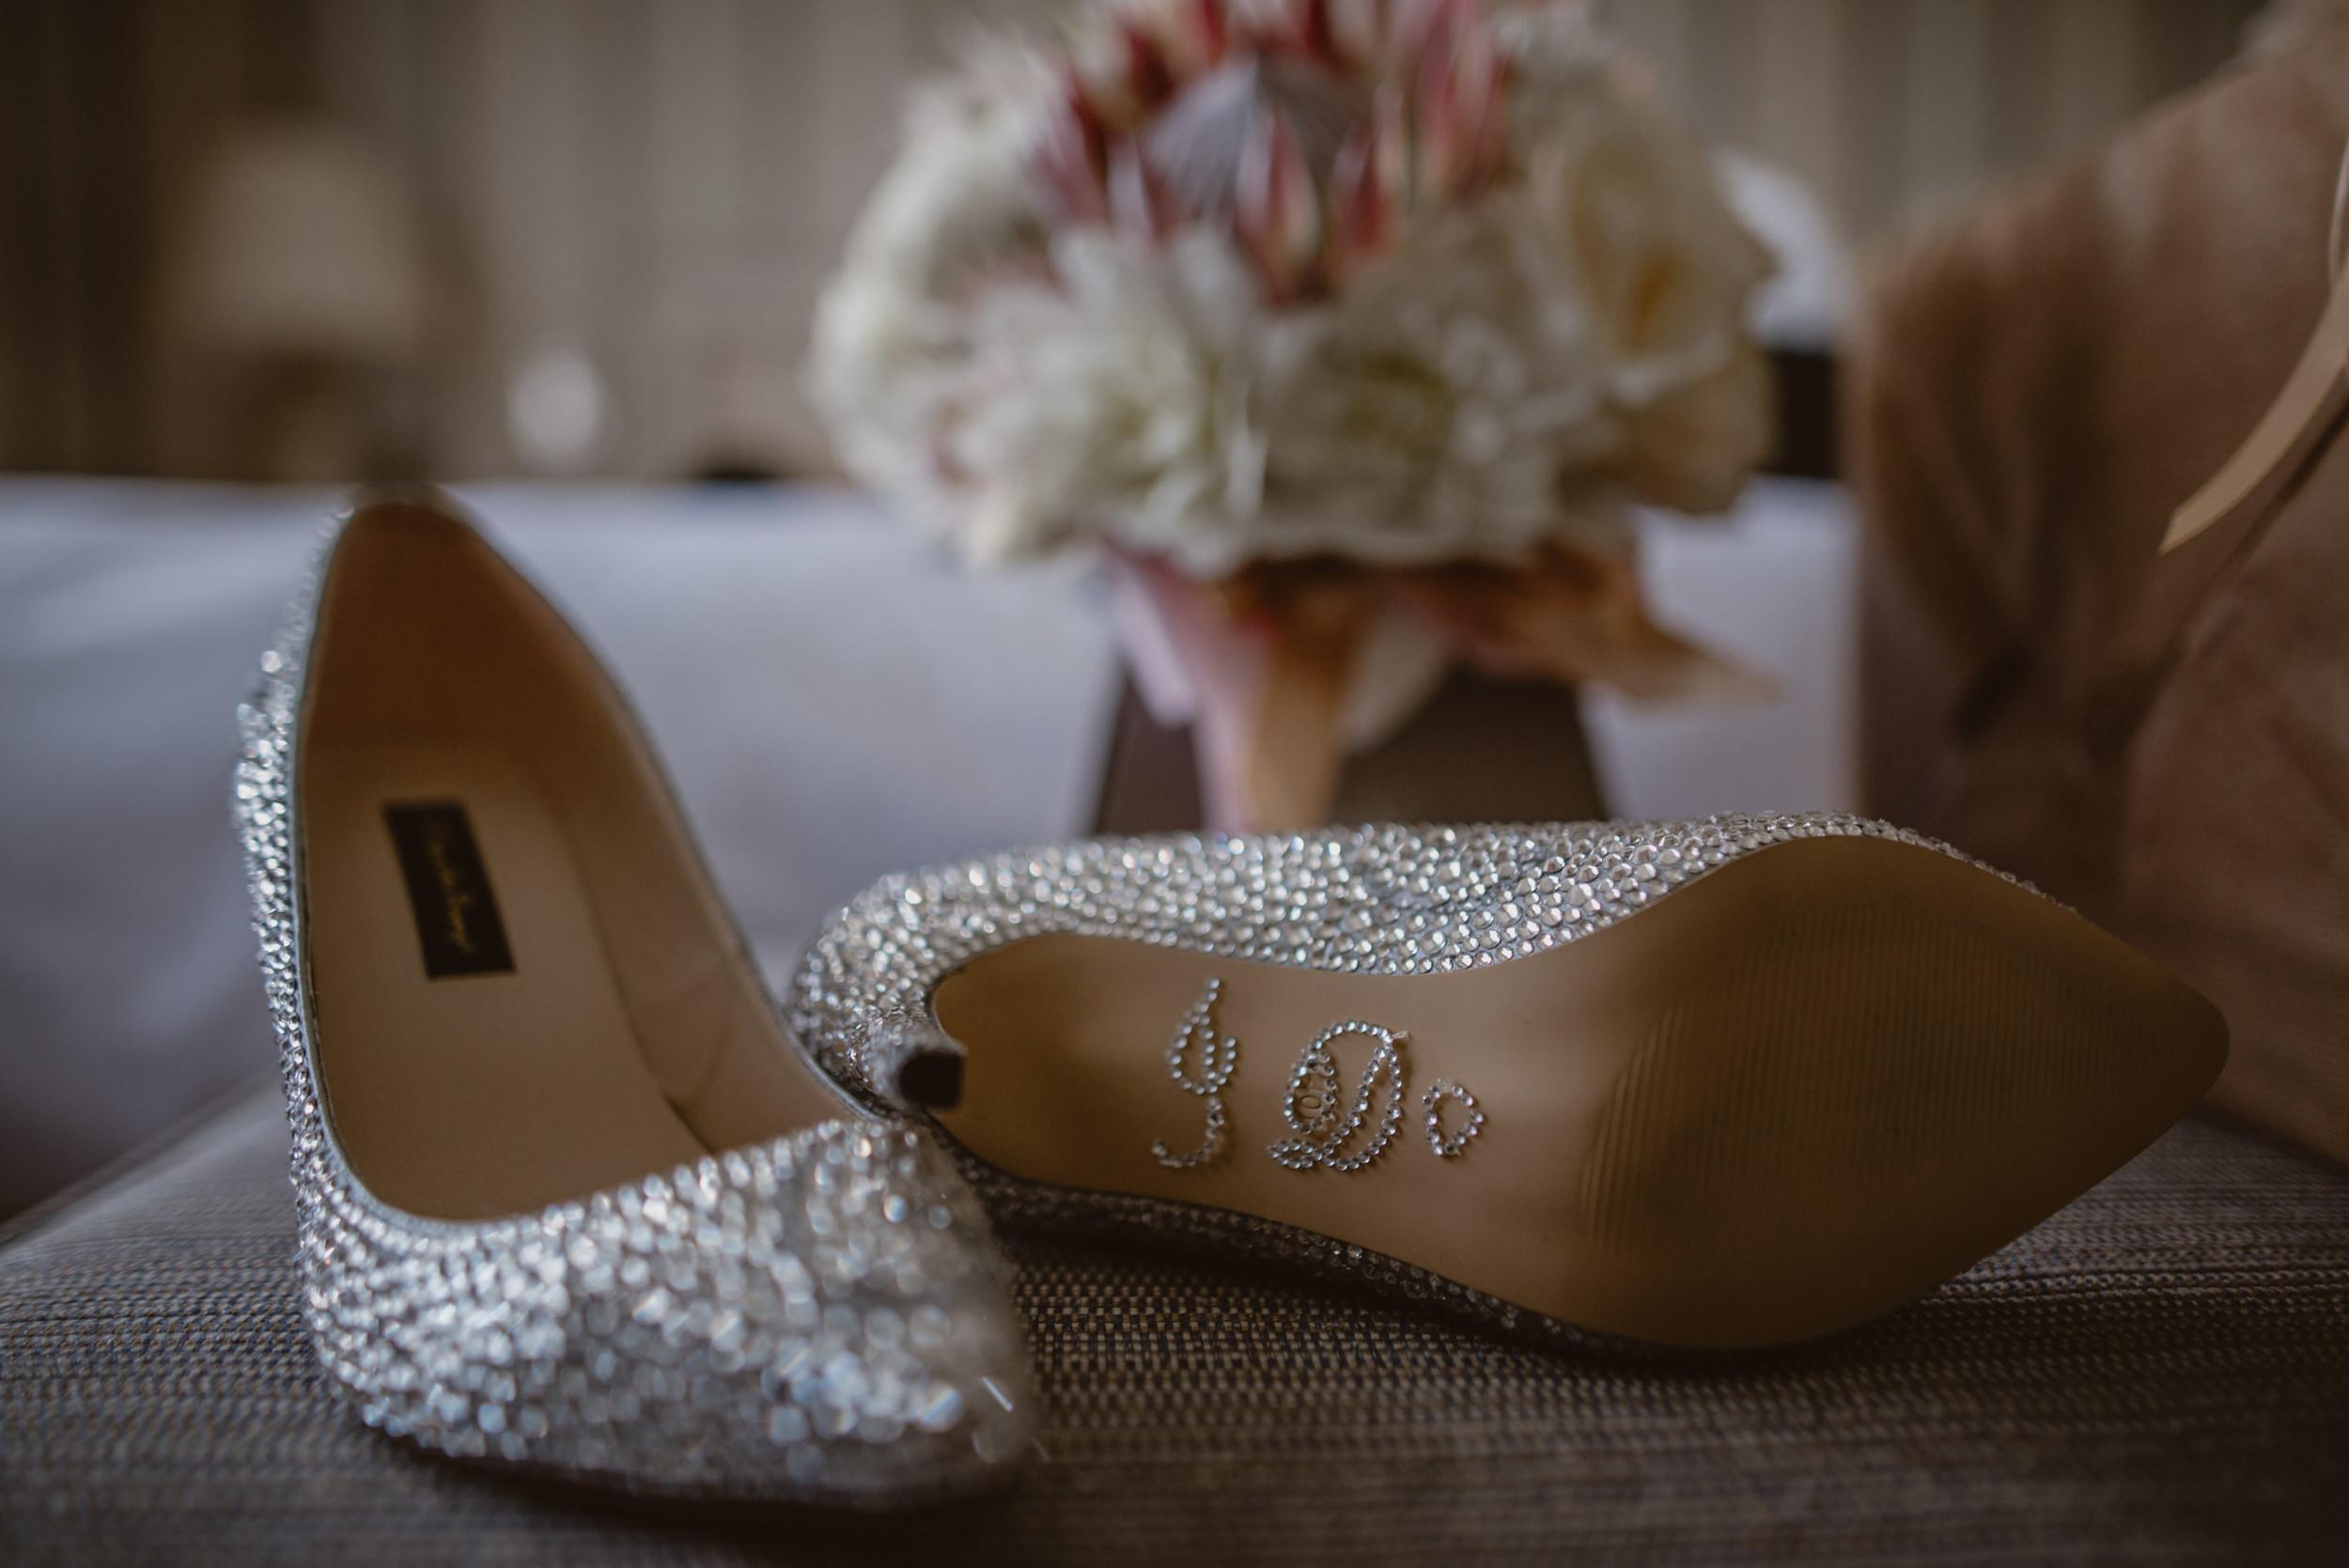 Trisha-and-Roger-wedding-The-Priory-Church-and-Chewton-Glen-Hotel-Christchurch-Manu-Mendoza-Wedding-Photography-018.jpg